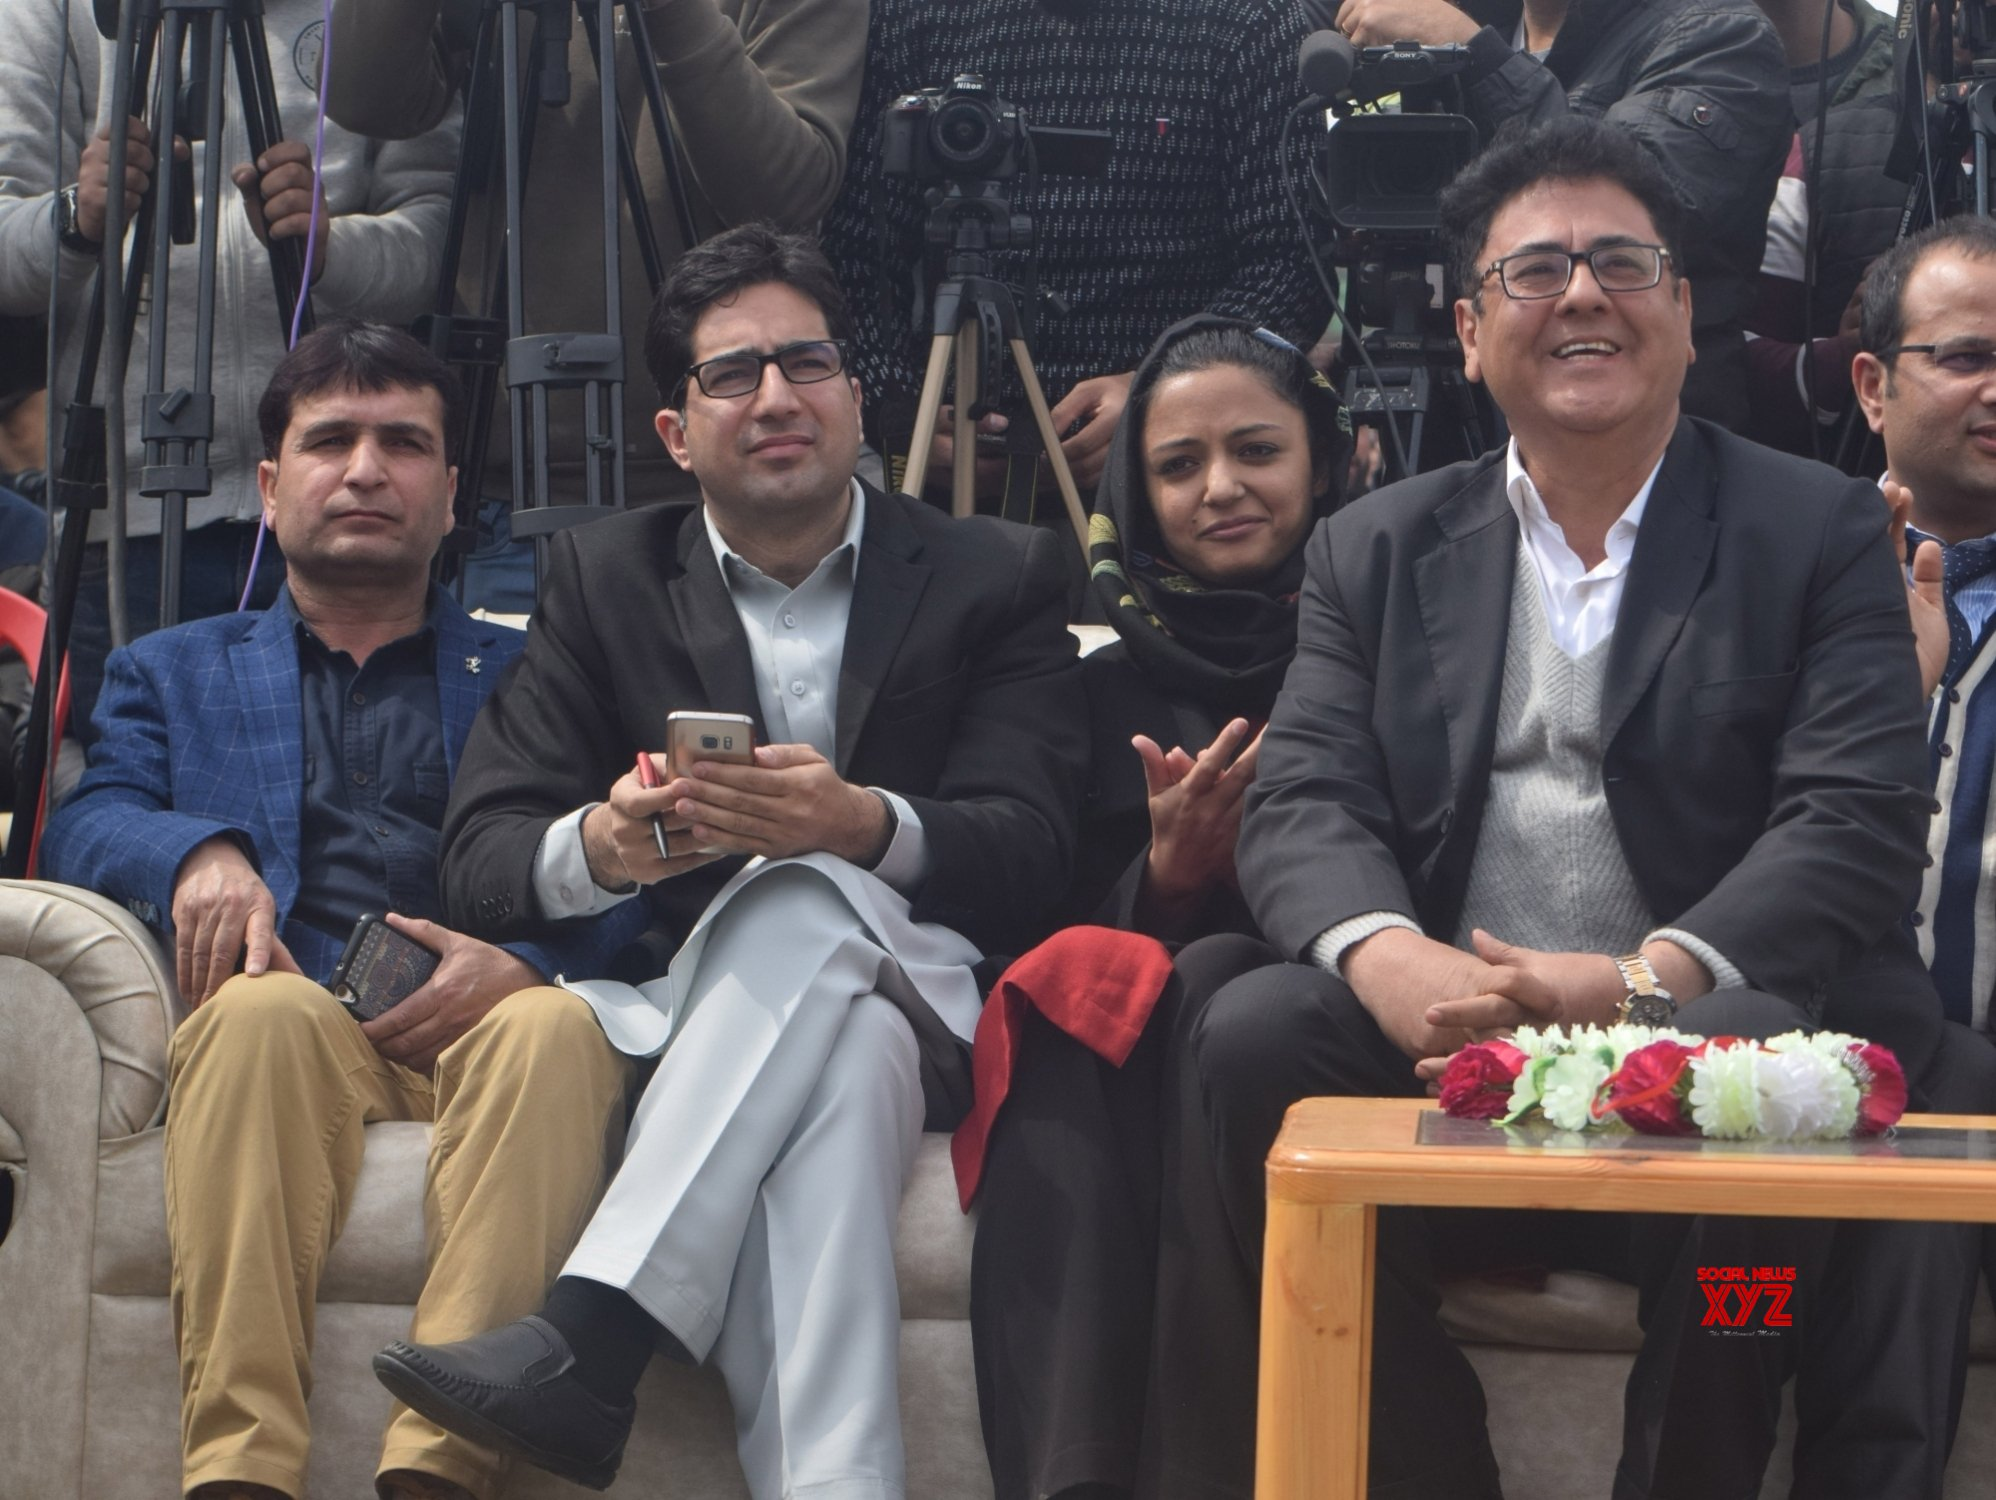 Srinagar: Shah Faesal launches J&K People's Movement #Gallery